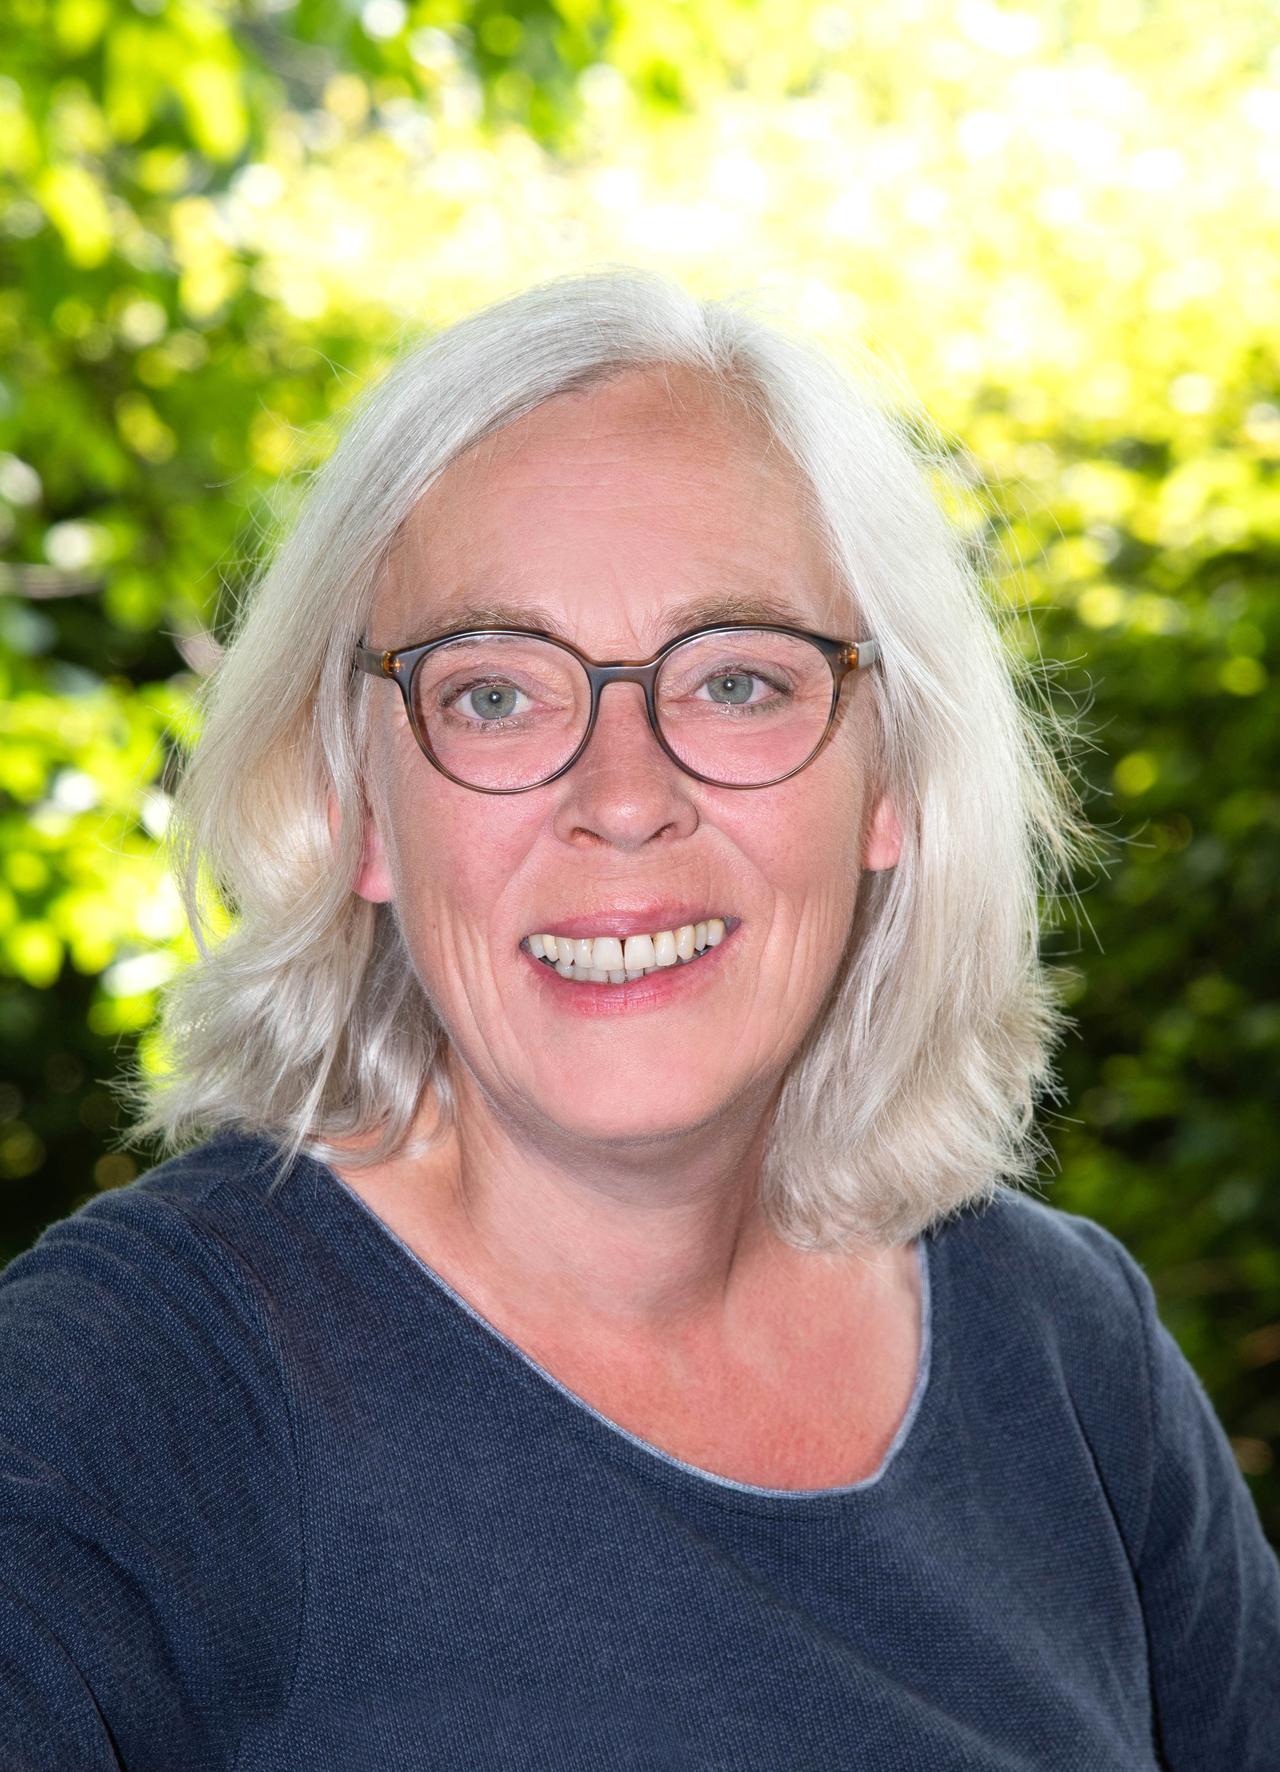 Heidi Syska